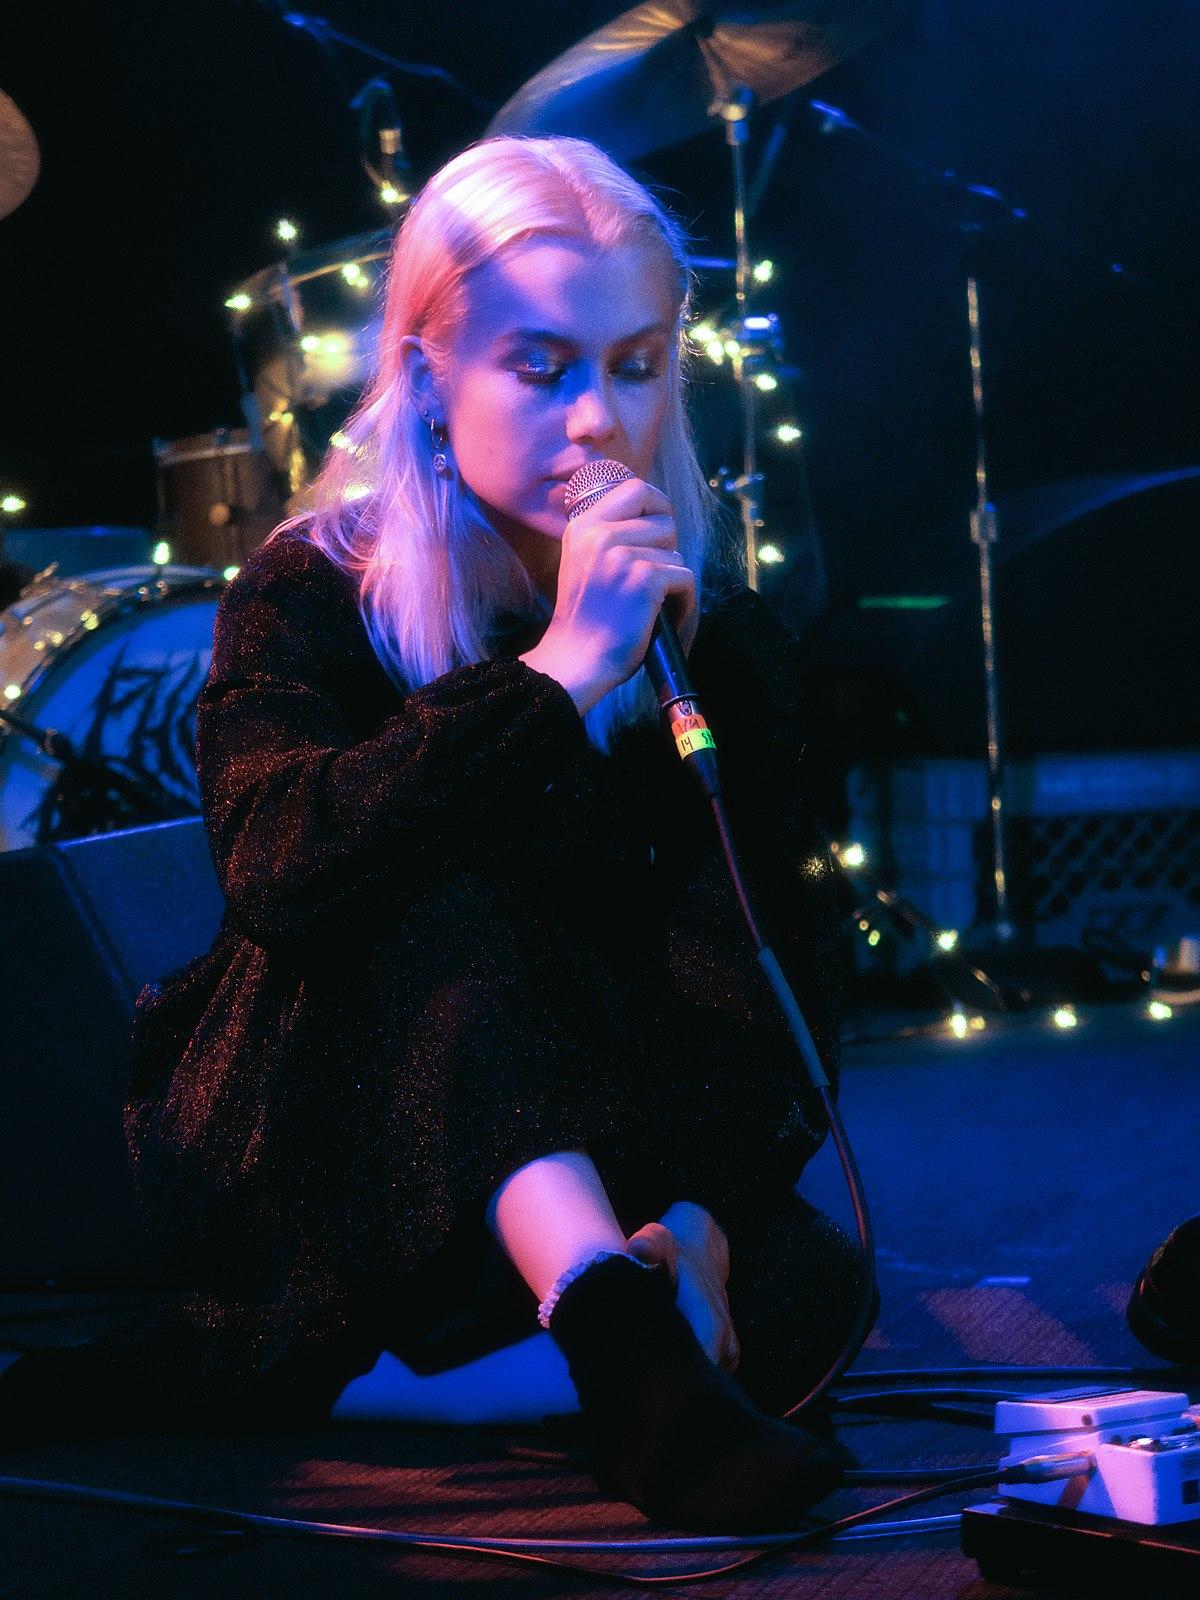 Phoebe Bridgers - Wikipedia